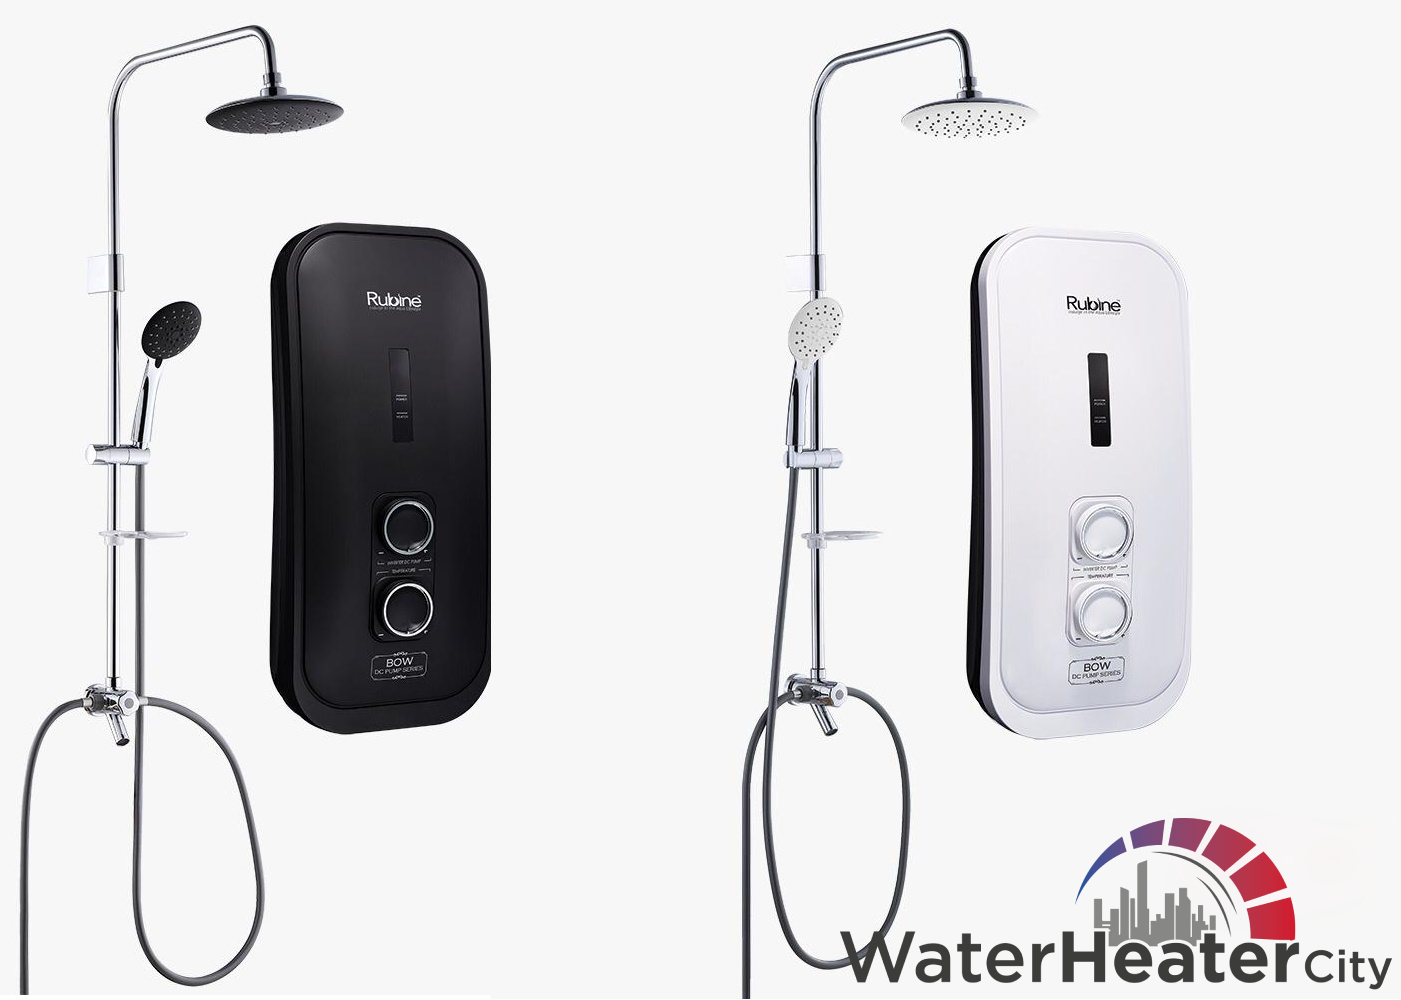 rubine-rwh-3388-instant-water-heater-water-heater-city-singapore